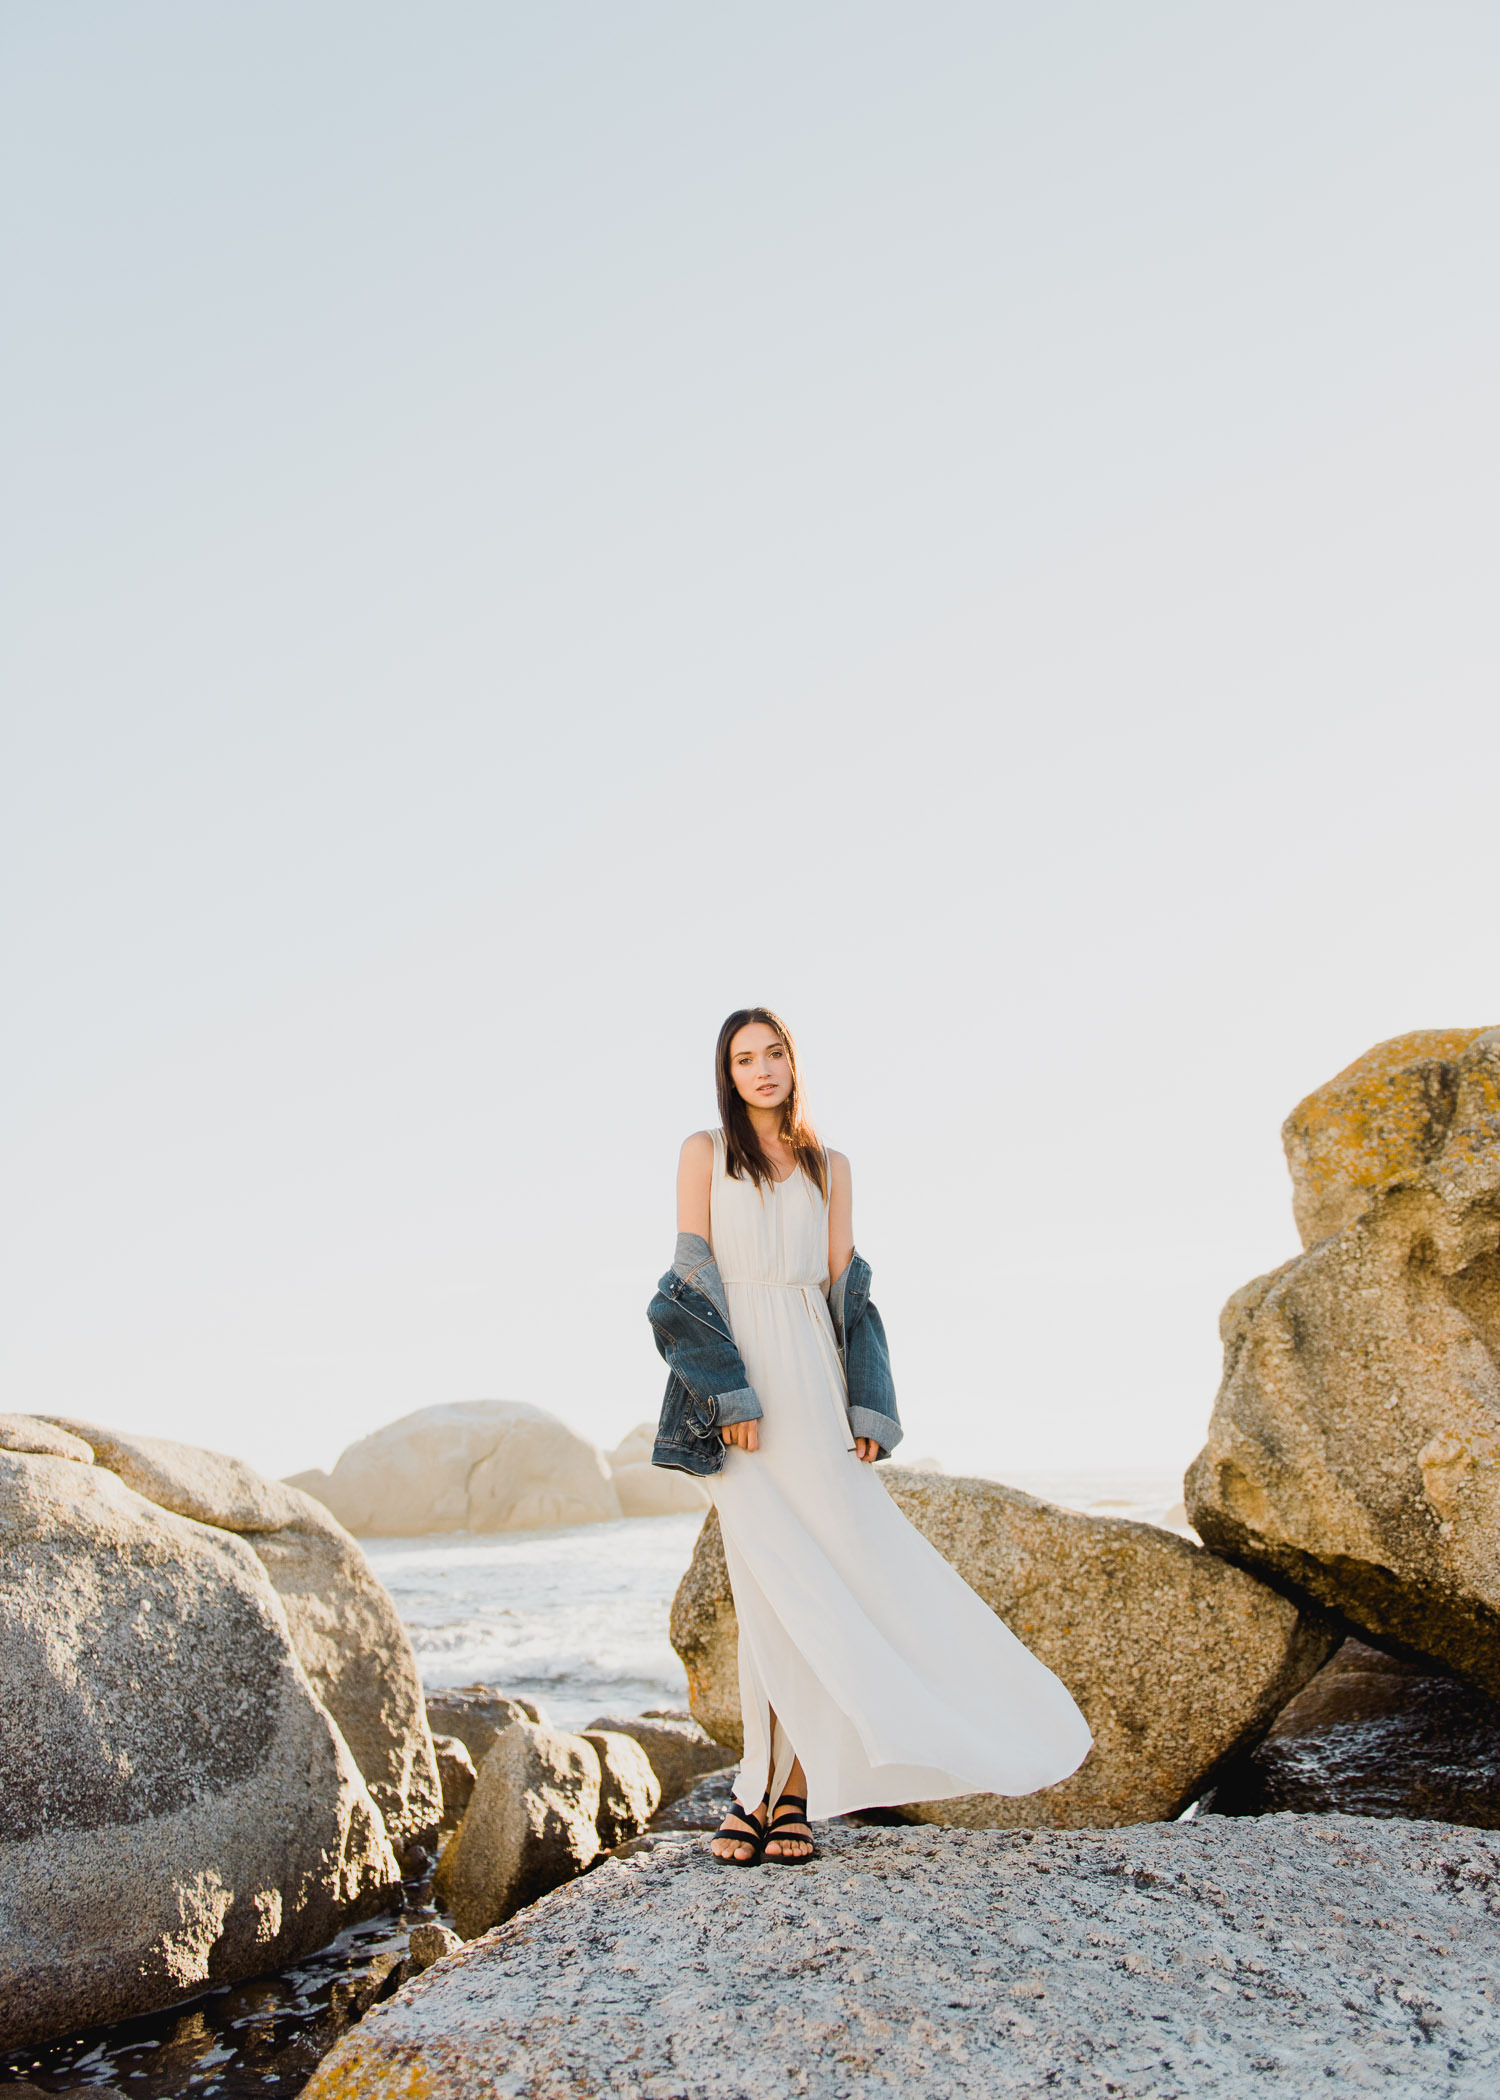 Beautiful model Julie's portrait taken at Beta Beach in Cape Town